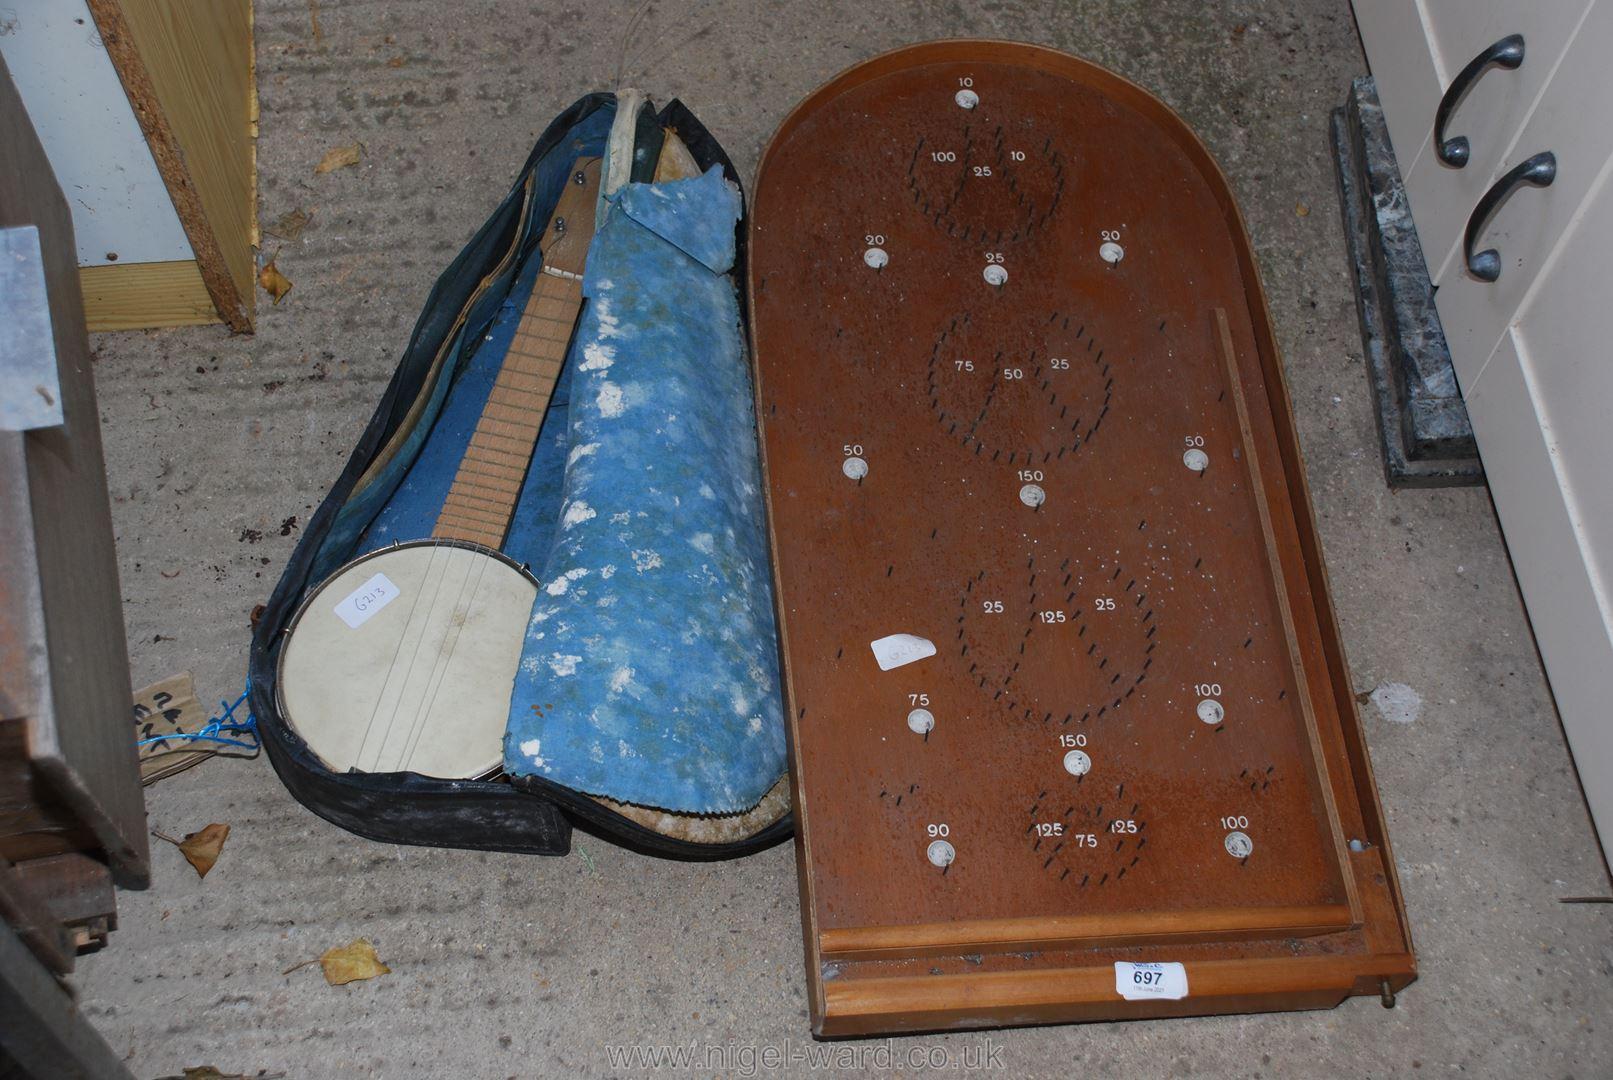 A Bagatelle board and a small banjo.